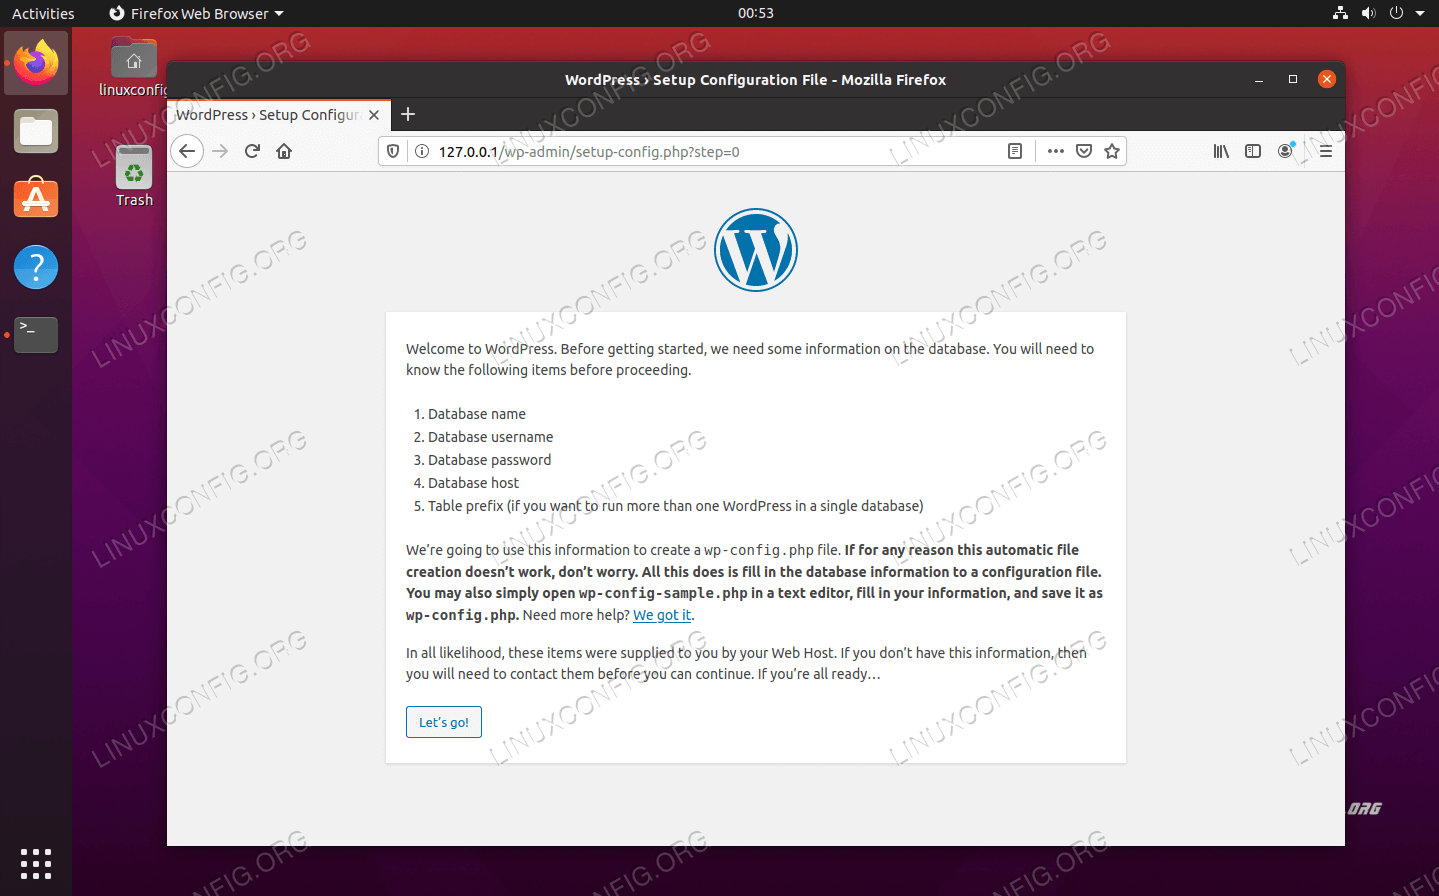 Initial WordPress setup wizard